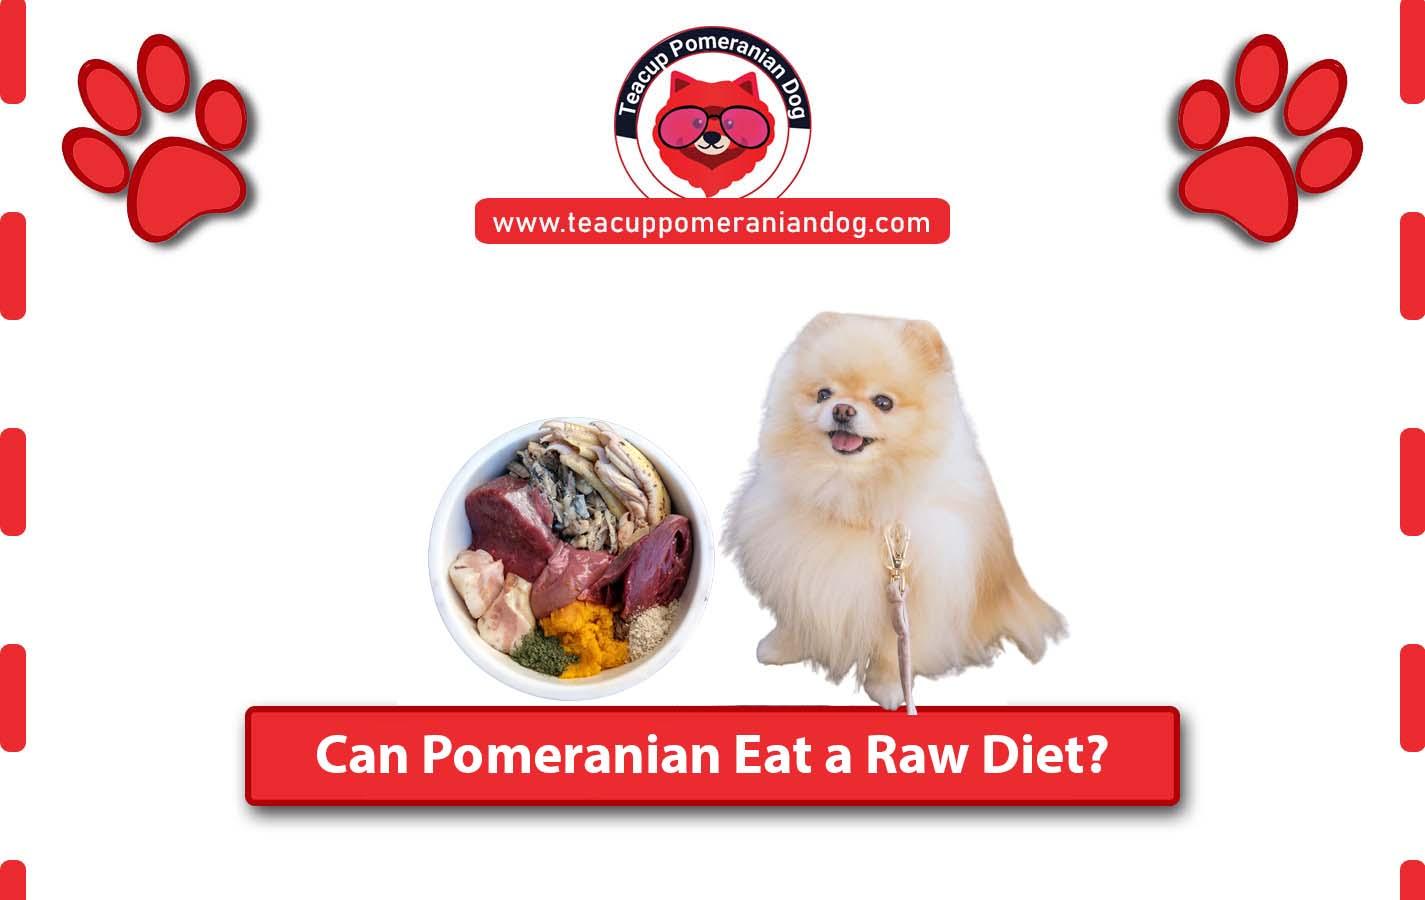 can a Pomeranian eat a raw diet